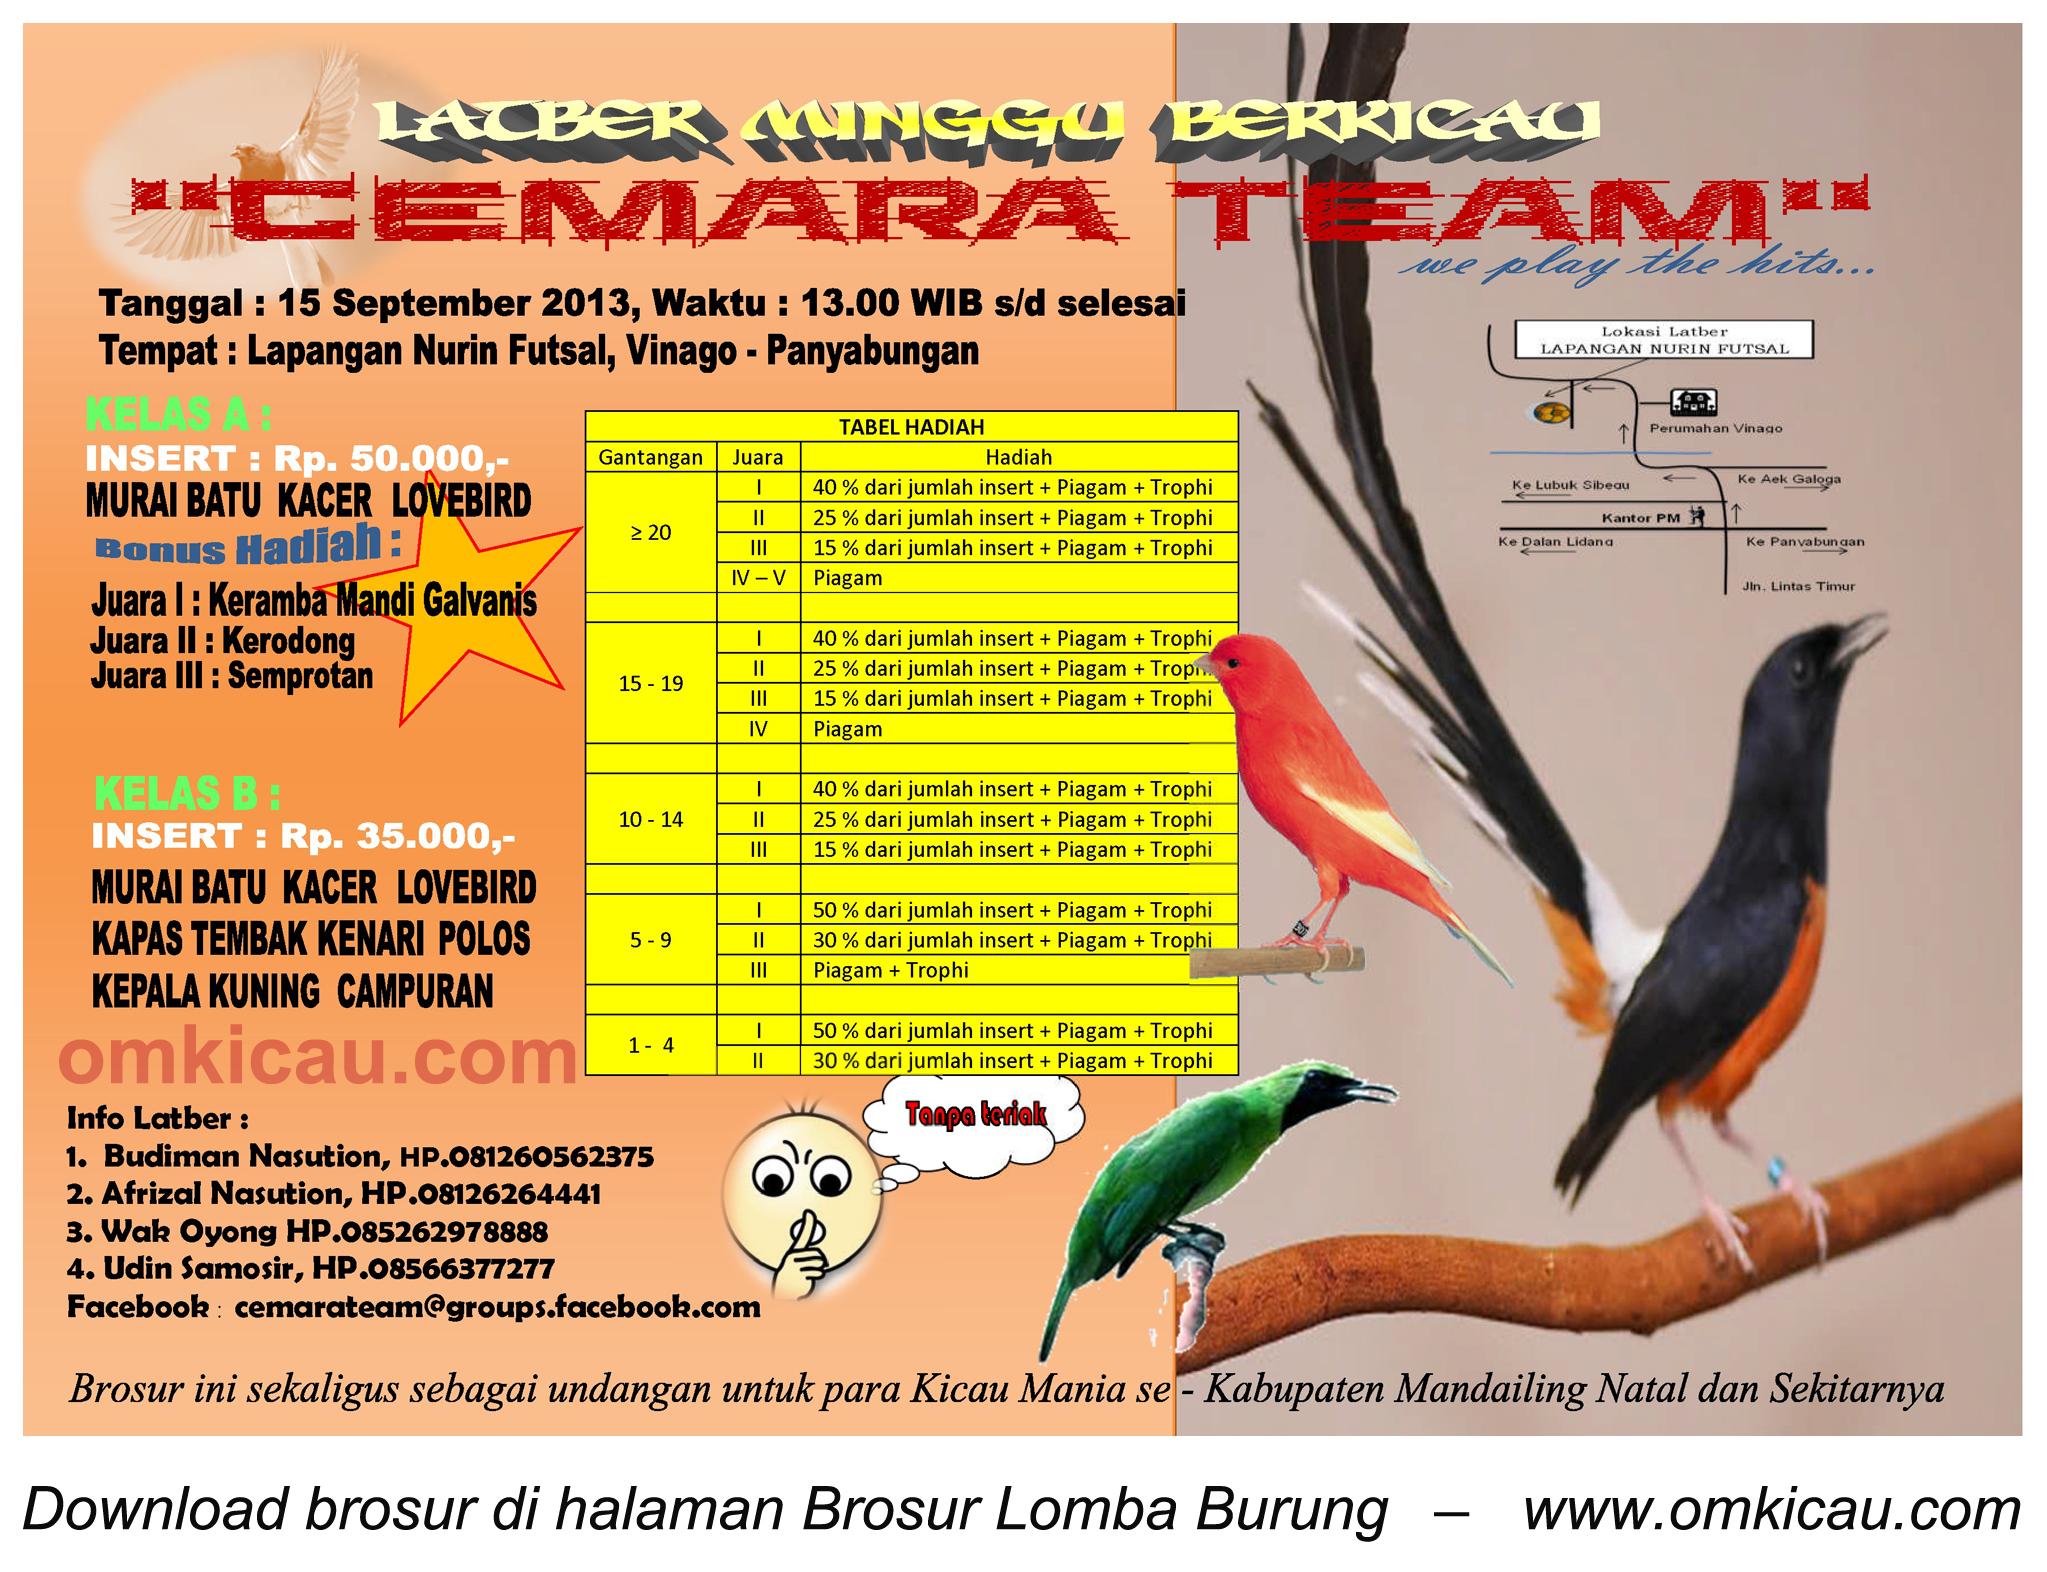 Brosur Latber Burung Berkicau Cemara Team, Mandailing Natal, 15 Sept 2013